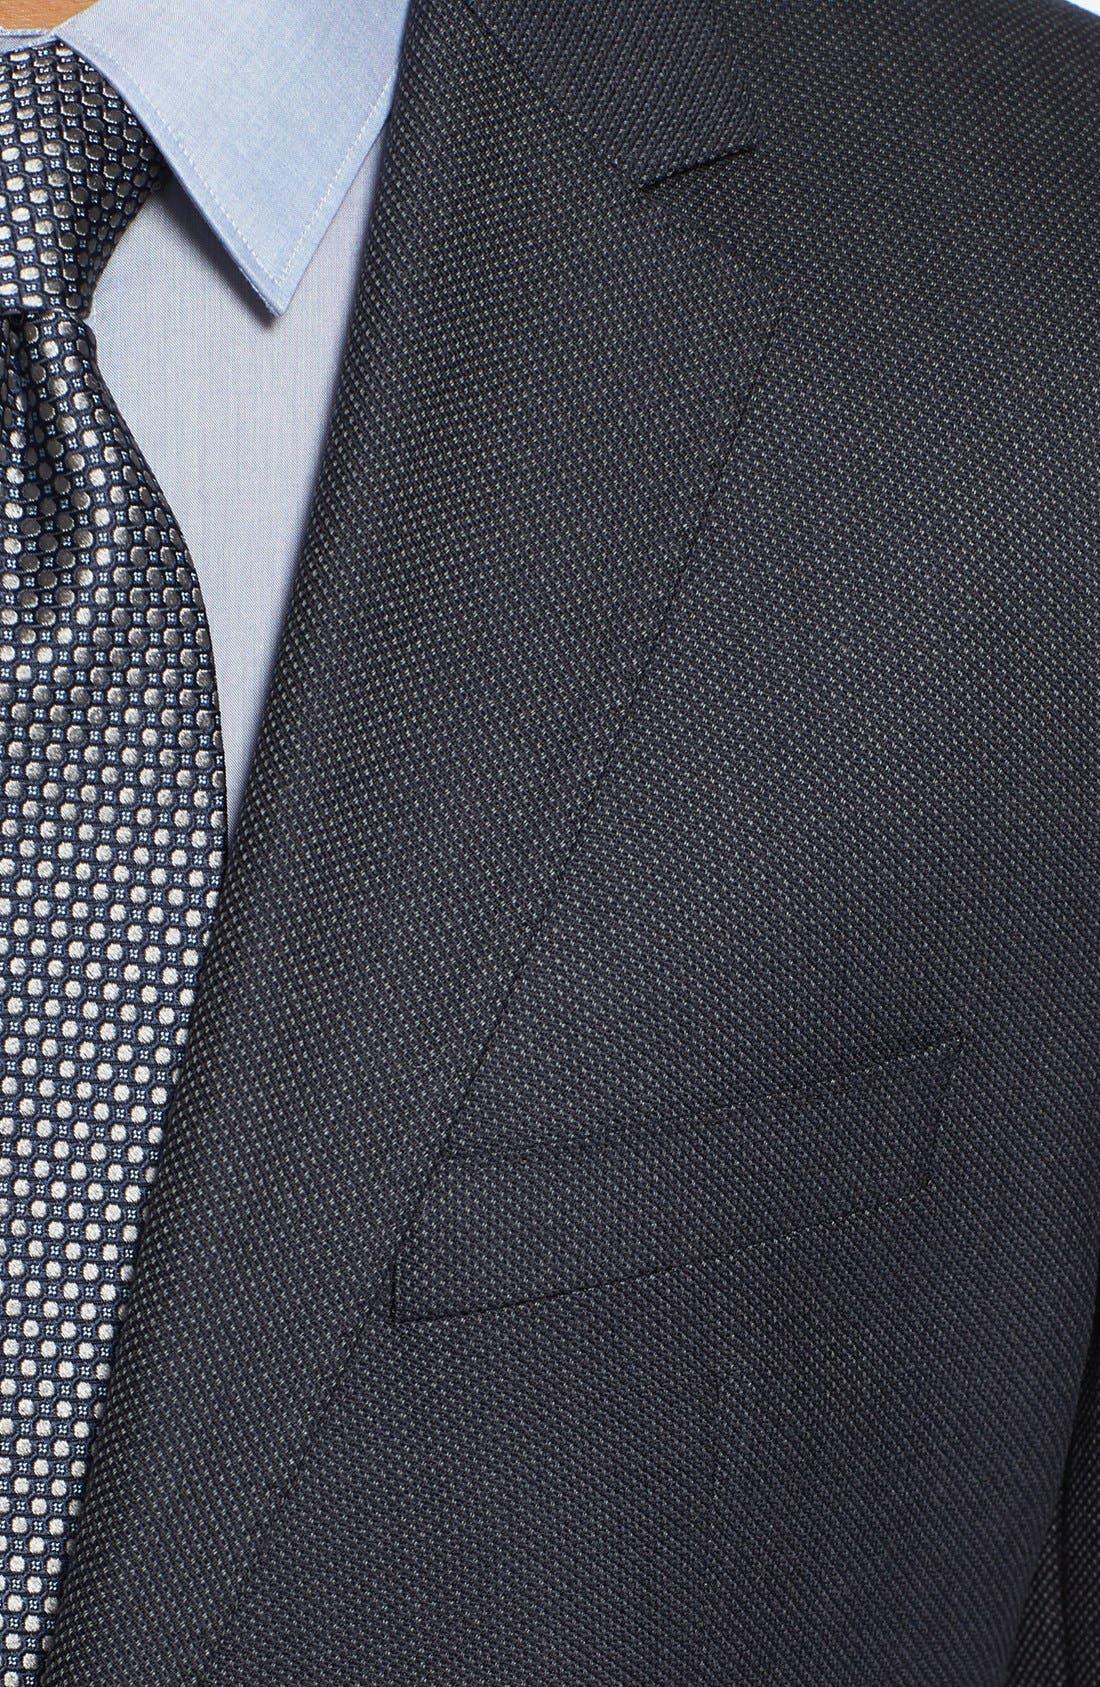 Alternate Image 2  - BOSS HUGO BOSS 'James' Trim Fit Wool Sportcoat